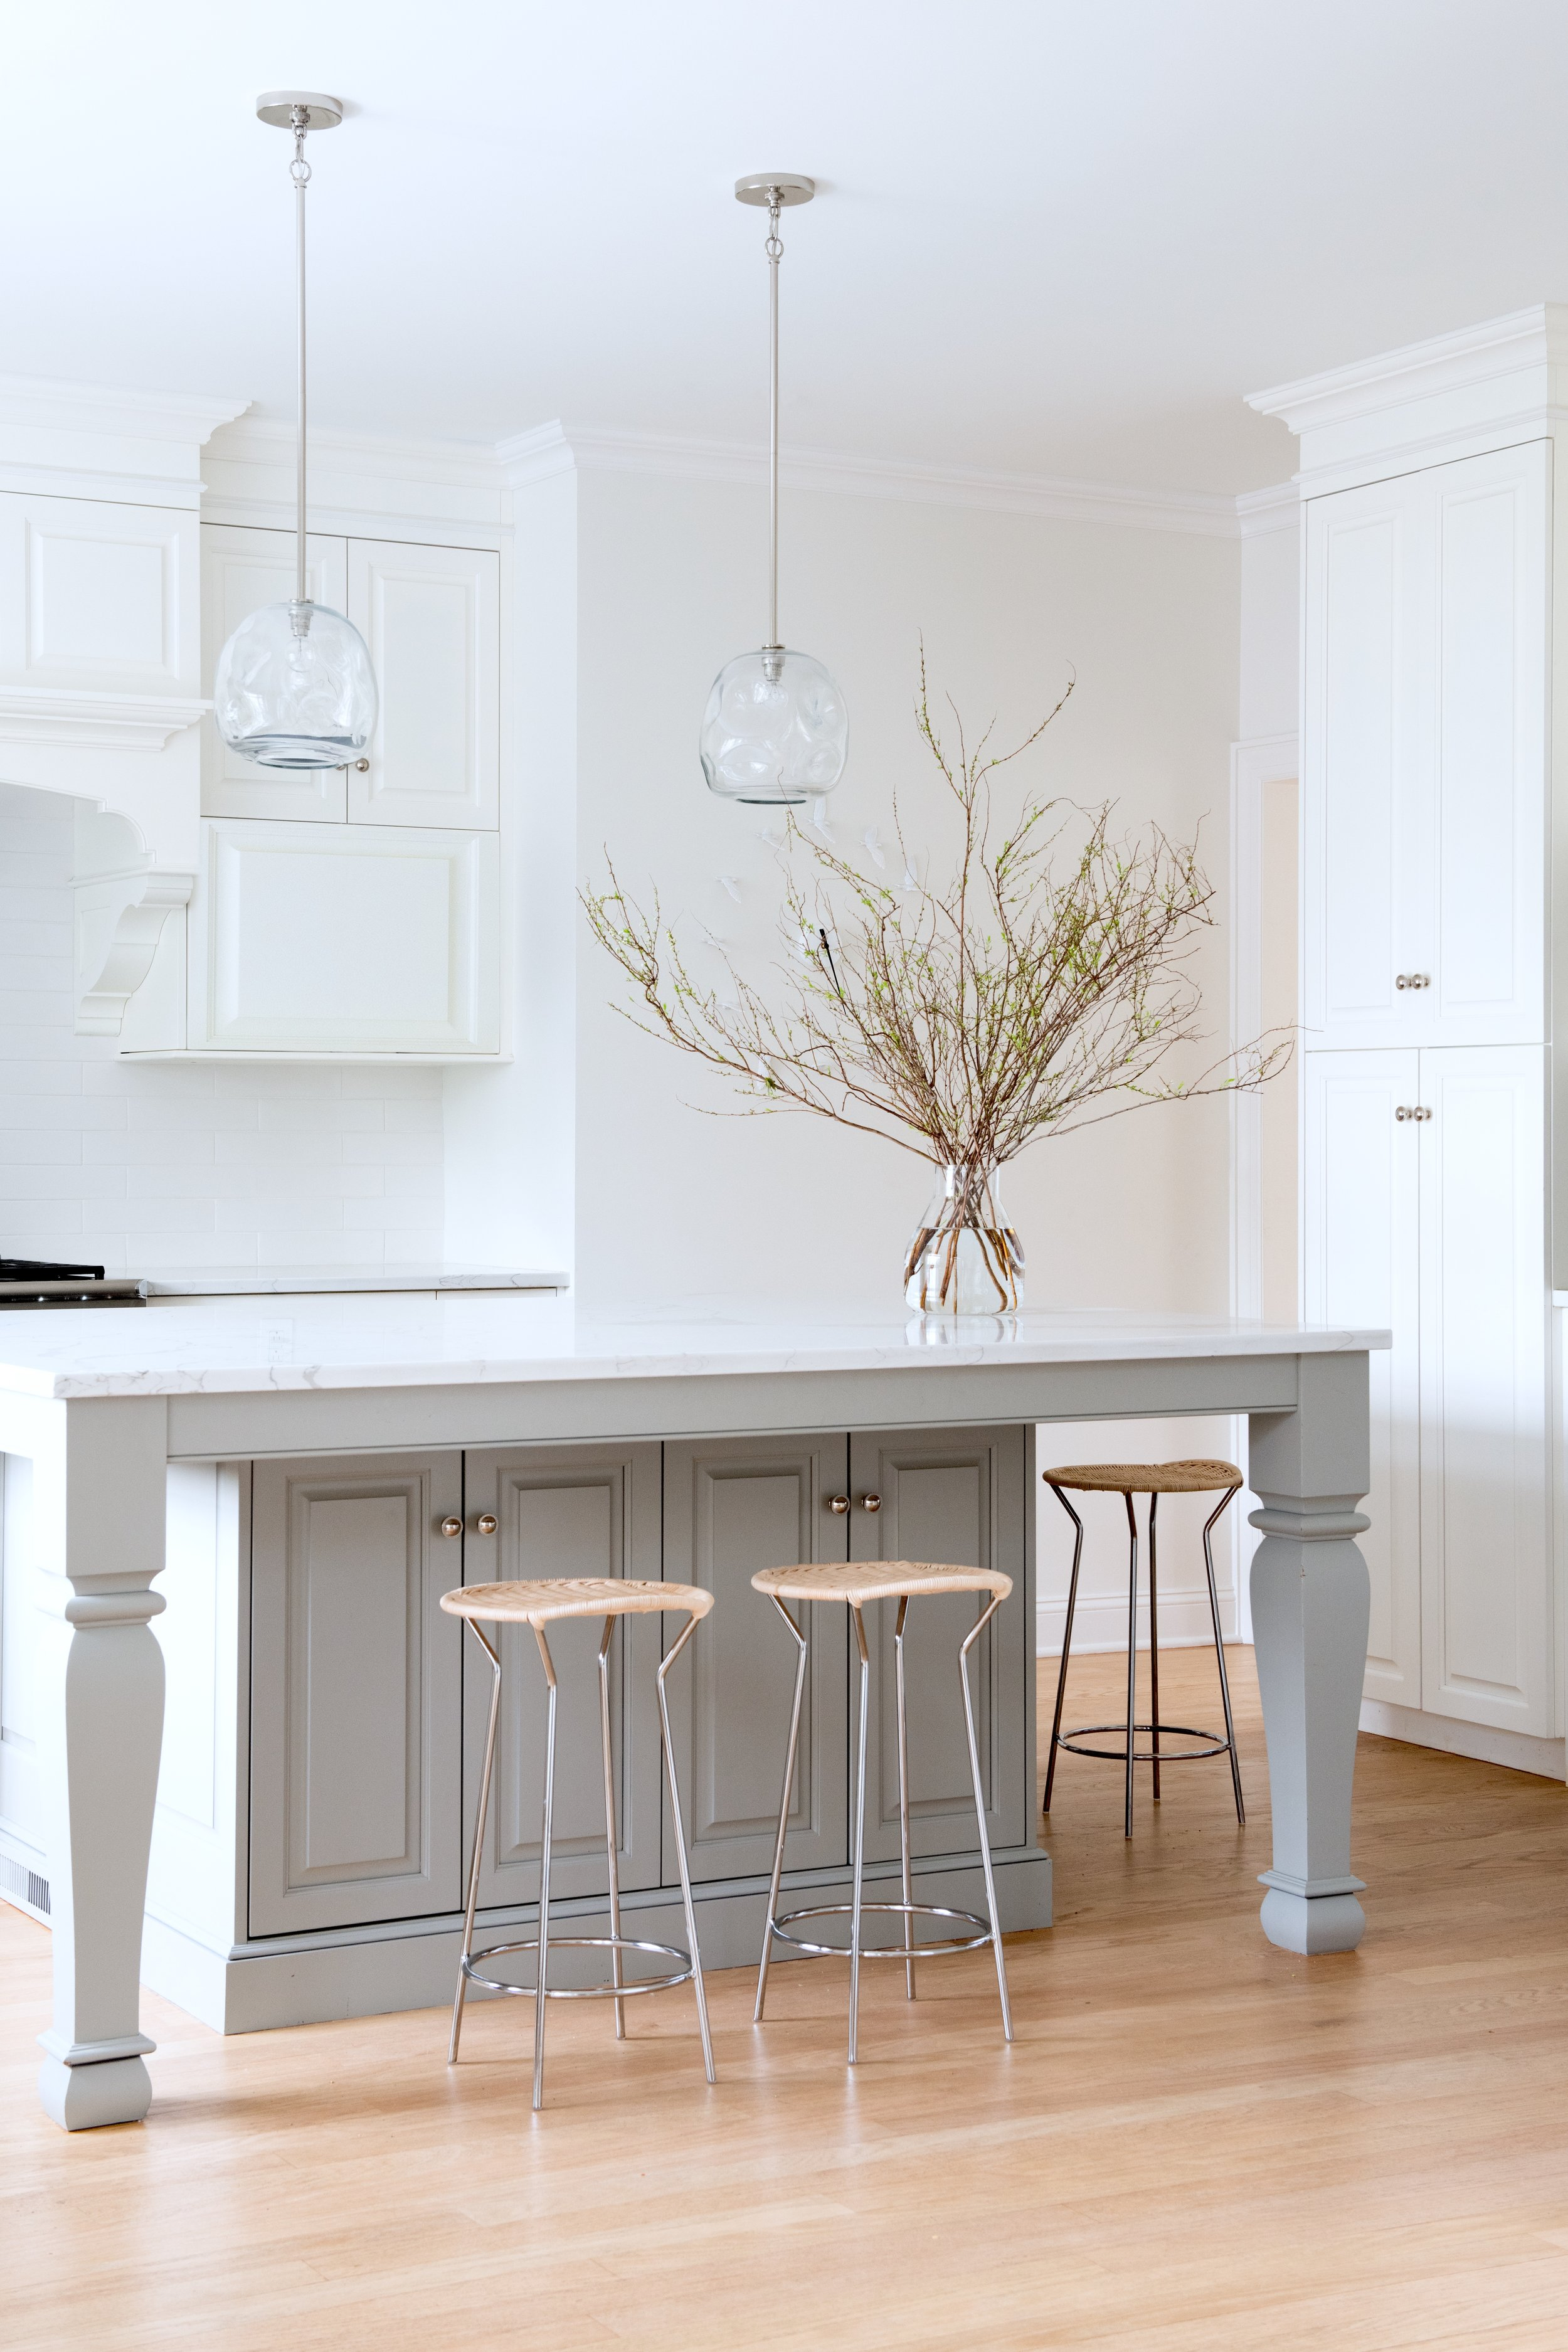 LAVA-interiors-MANOR-ROAD-RIDGEWOOD-NEW-JERSEY-HOME-HOUSE-RENOVATION-KITCHEN.jpg